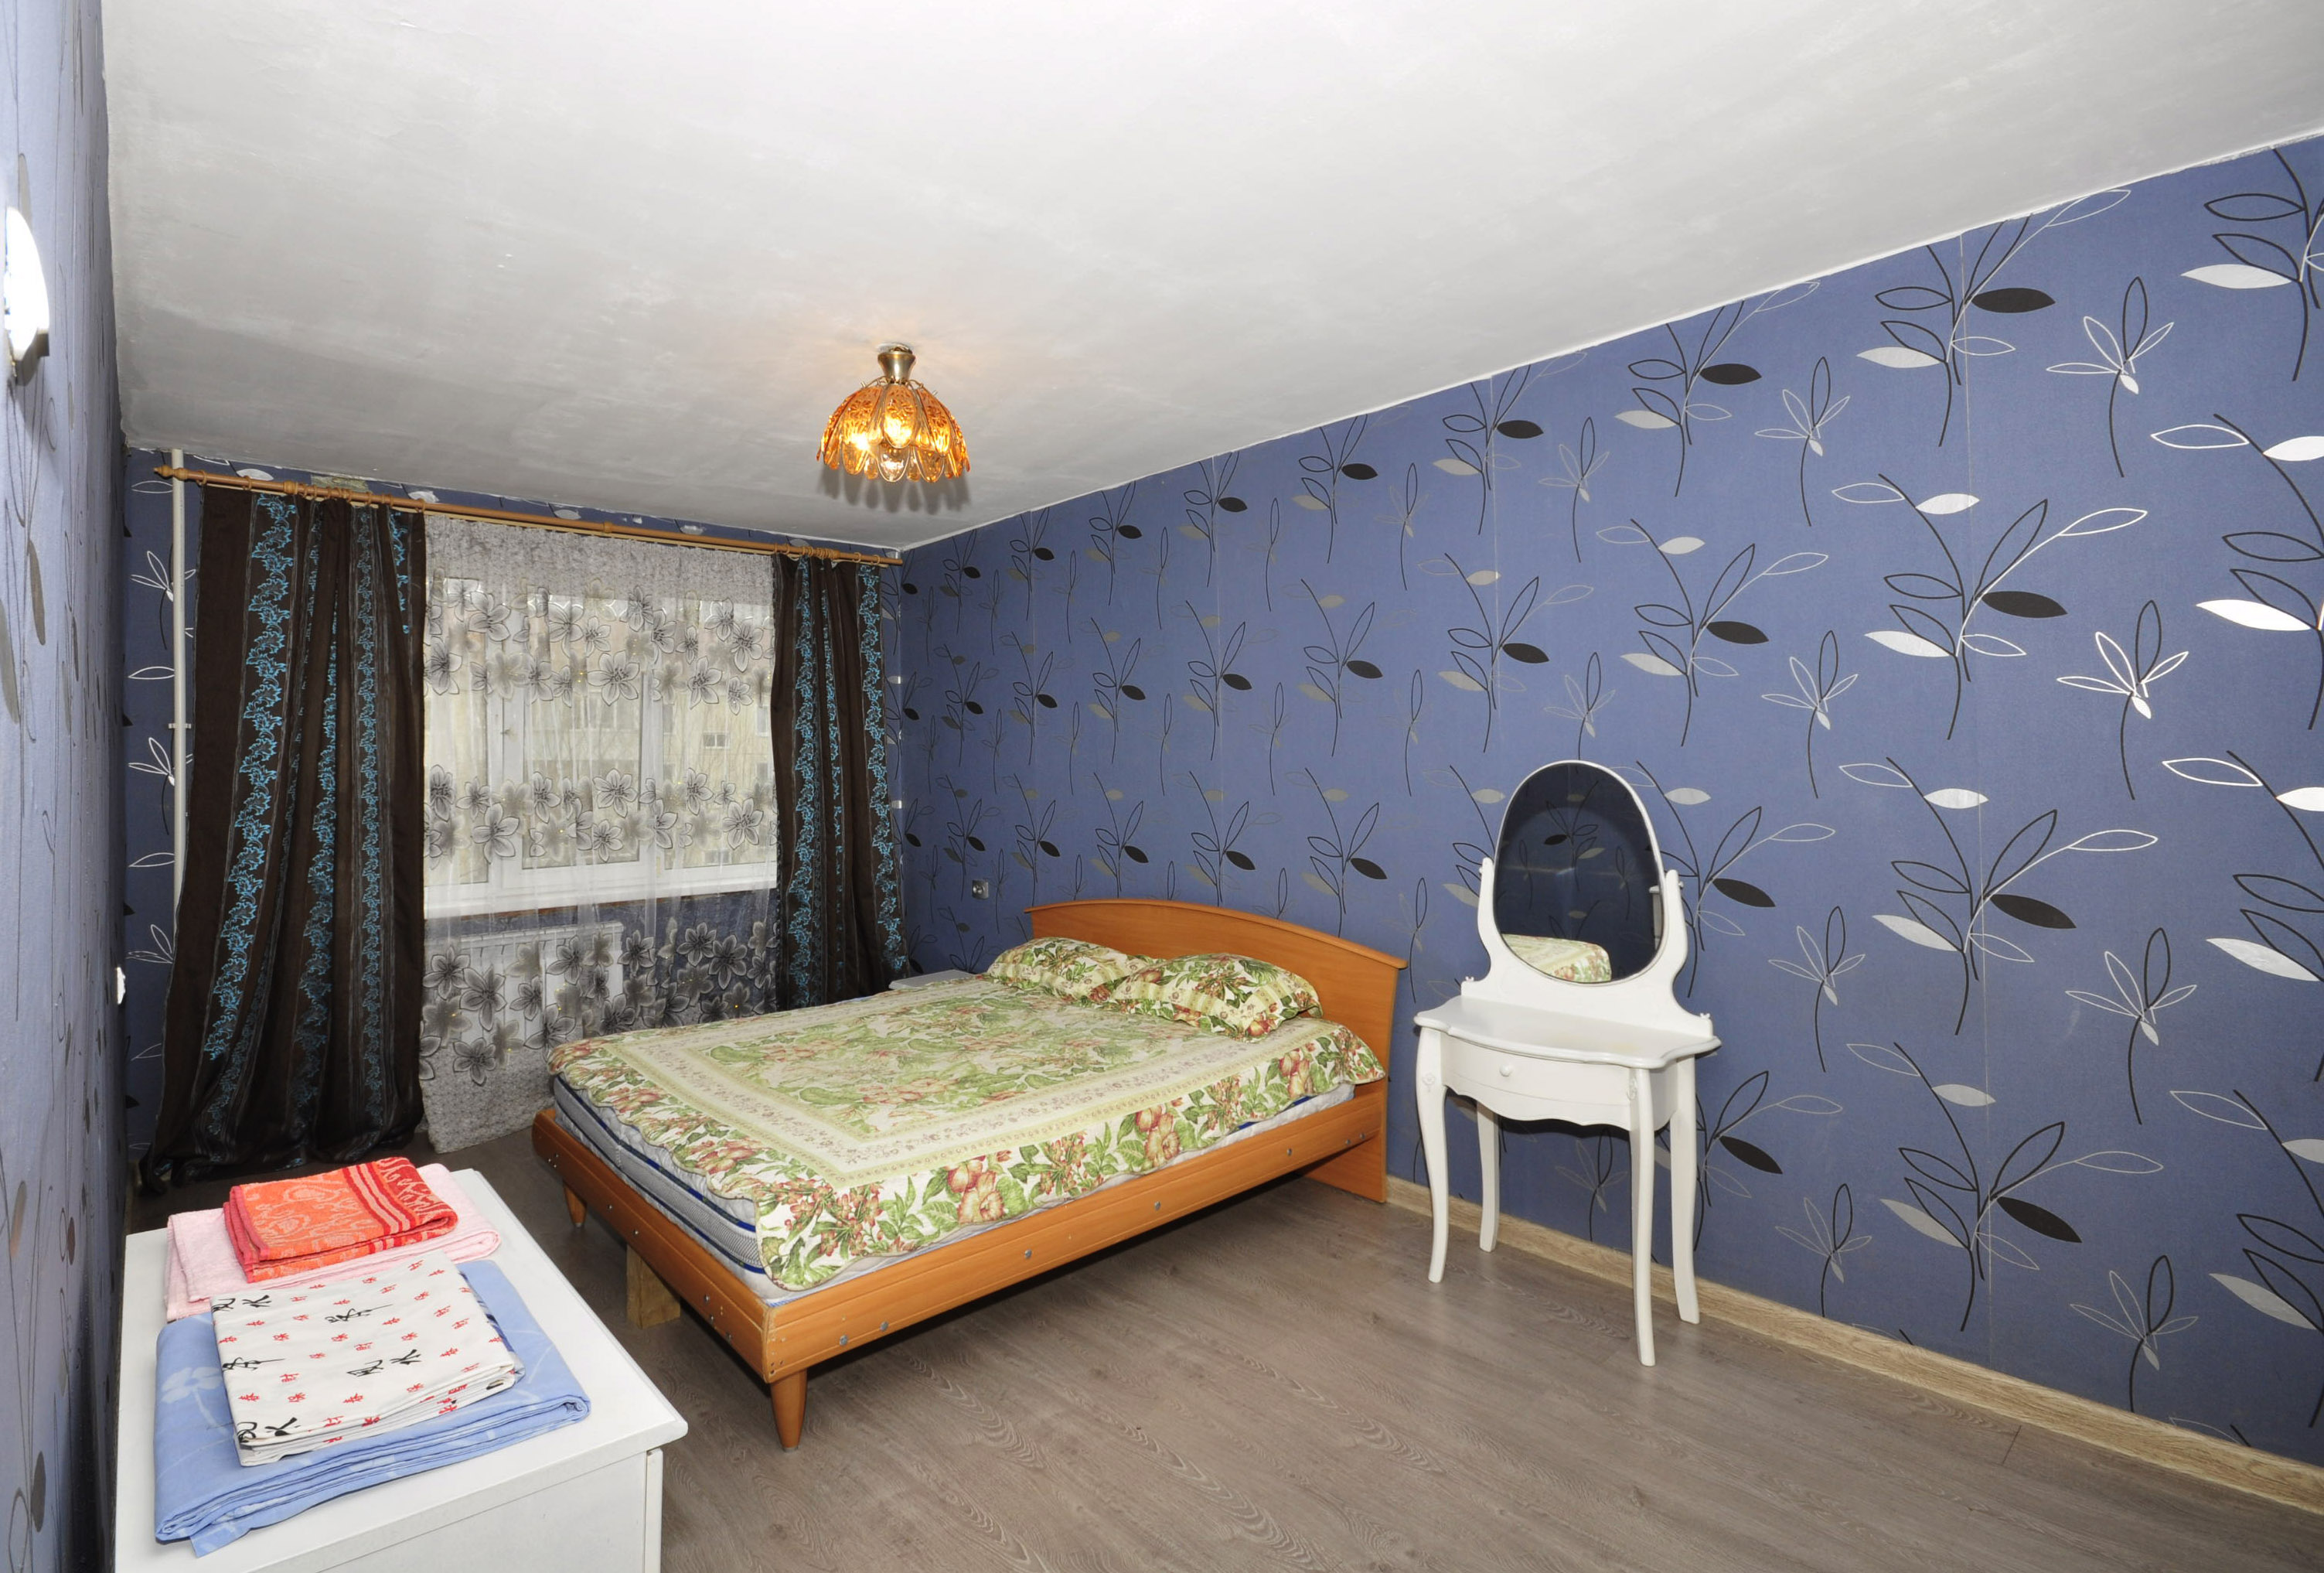 Сахалинская 5, 2-комнатная квартира эконом